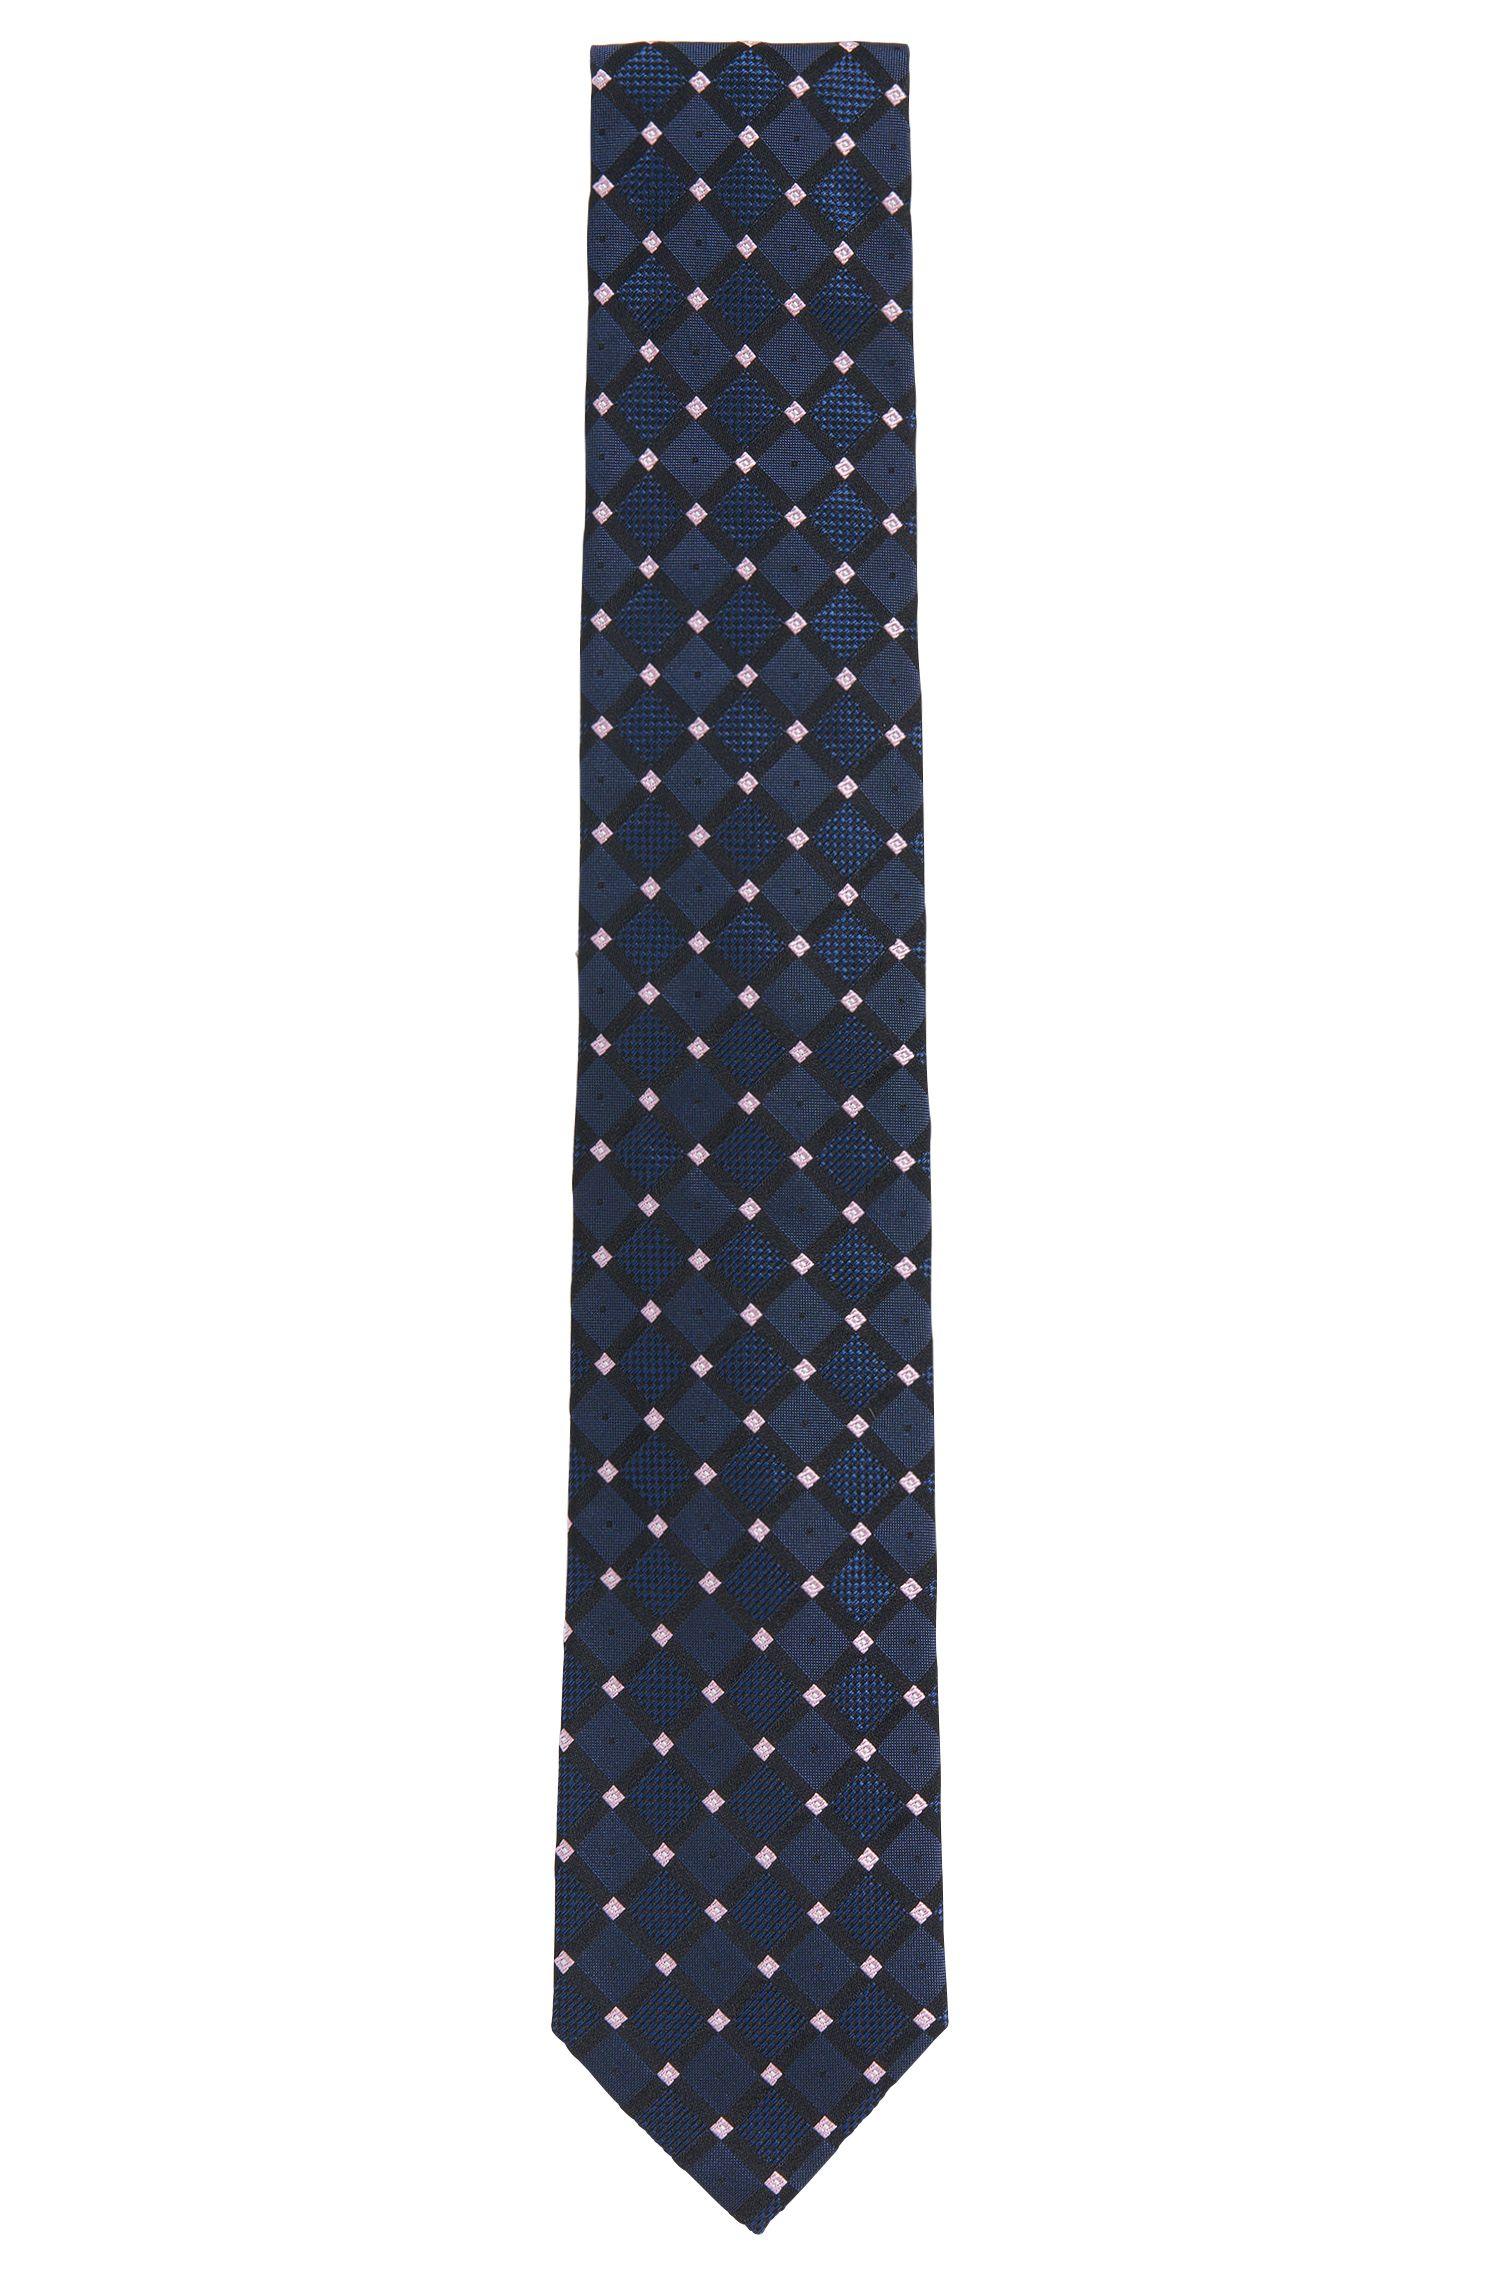 'Tie 7.5 cm' | Regular, Italian Silk Patterned Tie